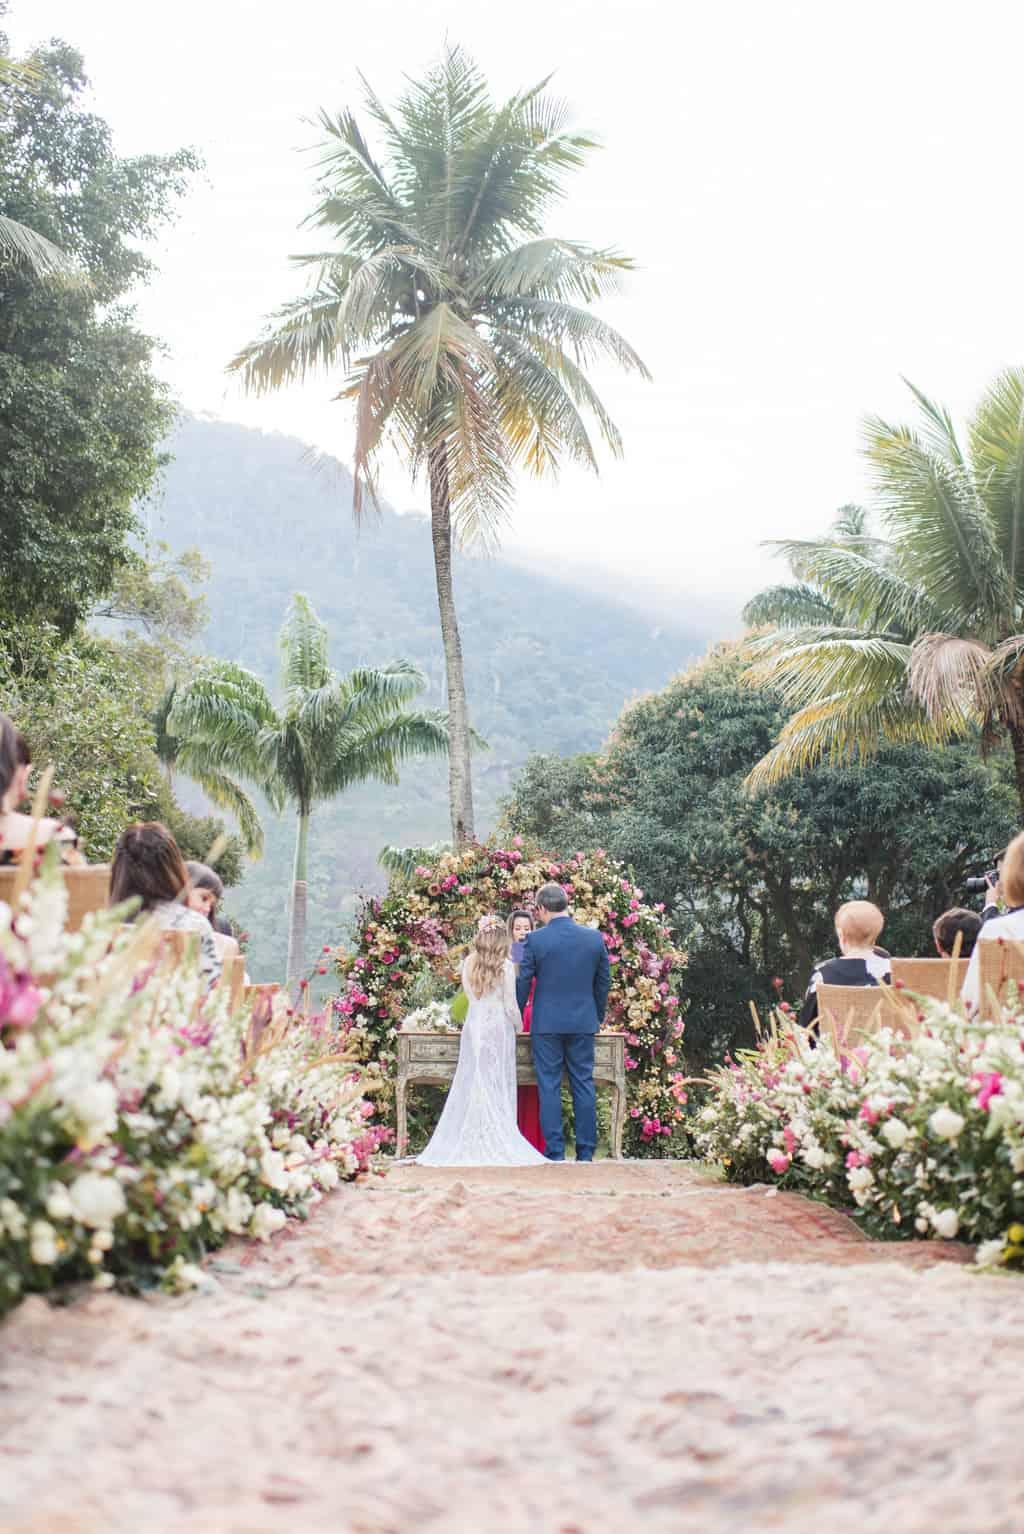 Casamento-Paula-e-Alex-Fotografia-Marina-Fava-Decor-Andrea-Kapps-cerimonia